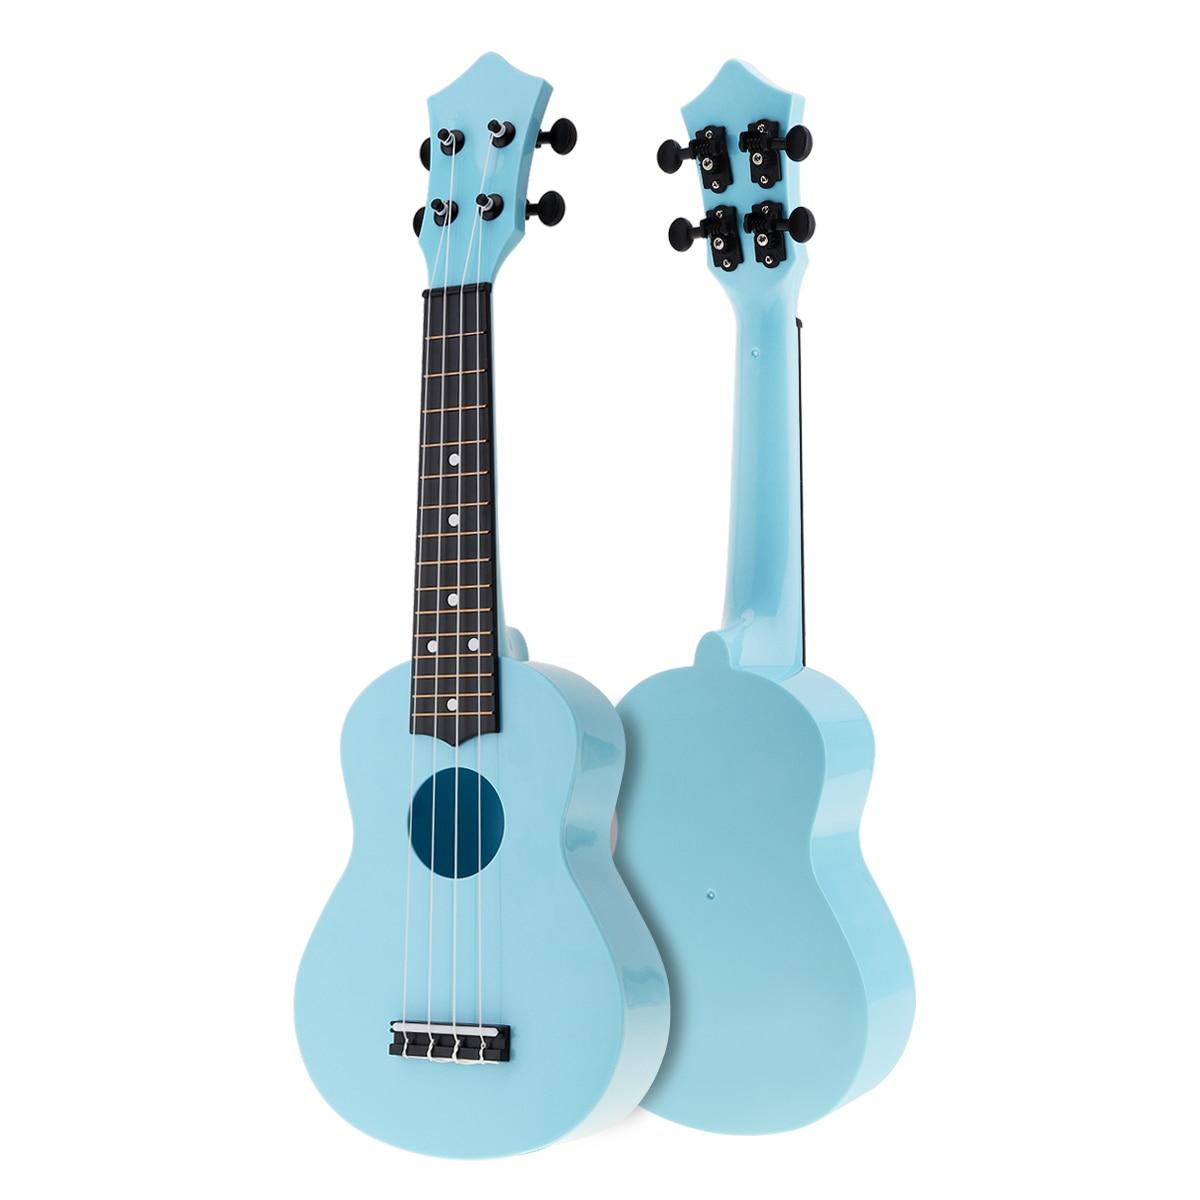 IRIN 21 Inch Colorful Acoustic Ukelele Uke 4 Strings Hawaii Guitar Guitarra Instrument for Kids and Music Beginner